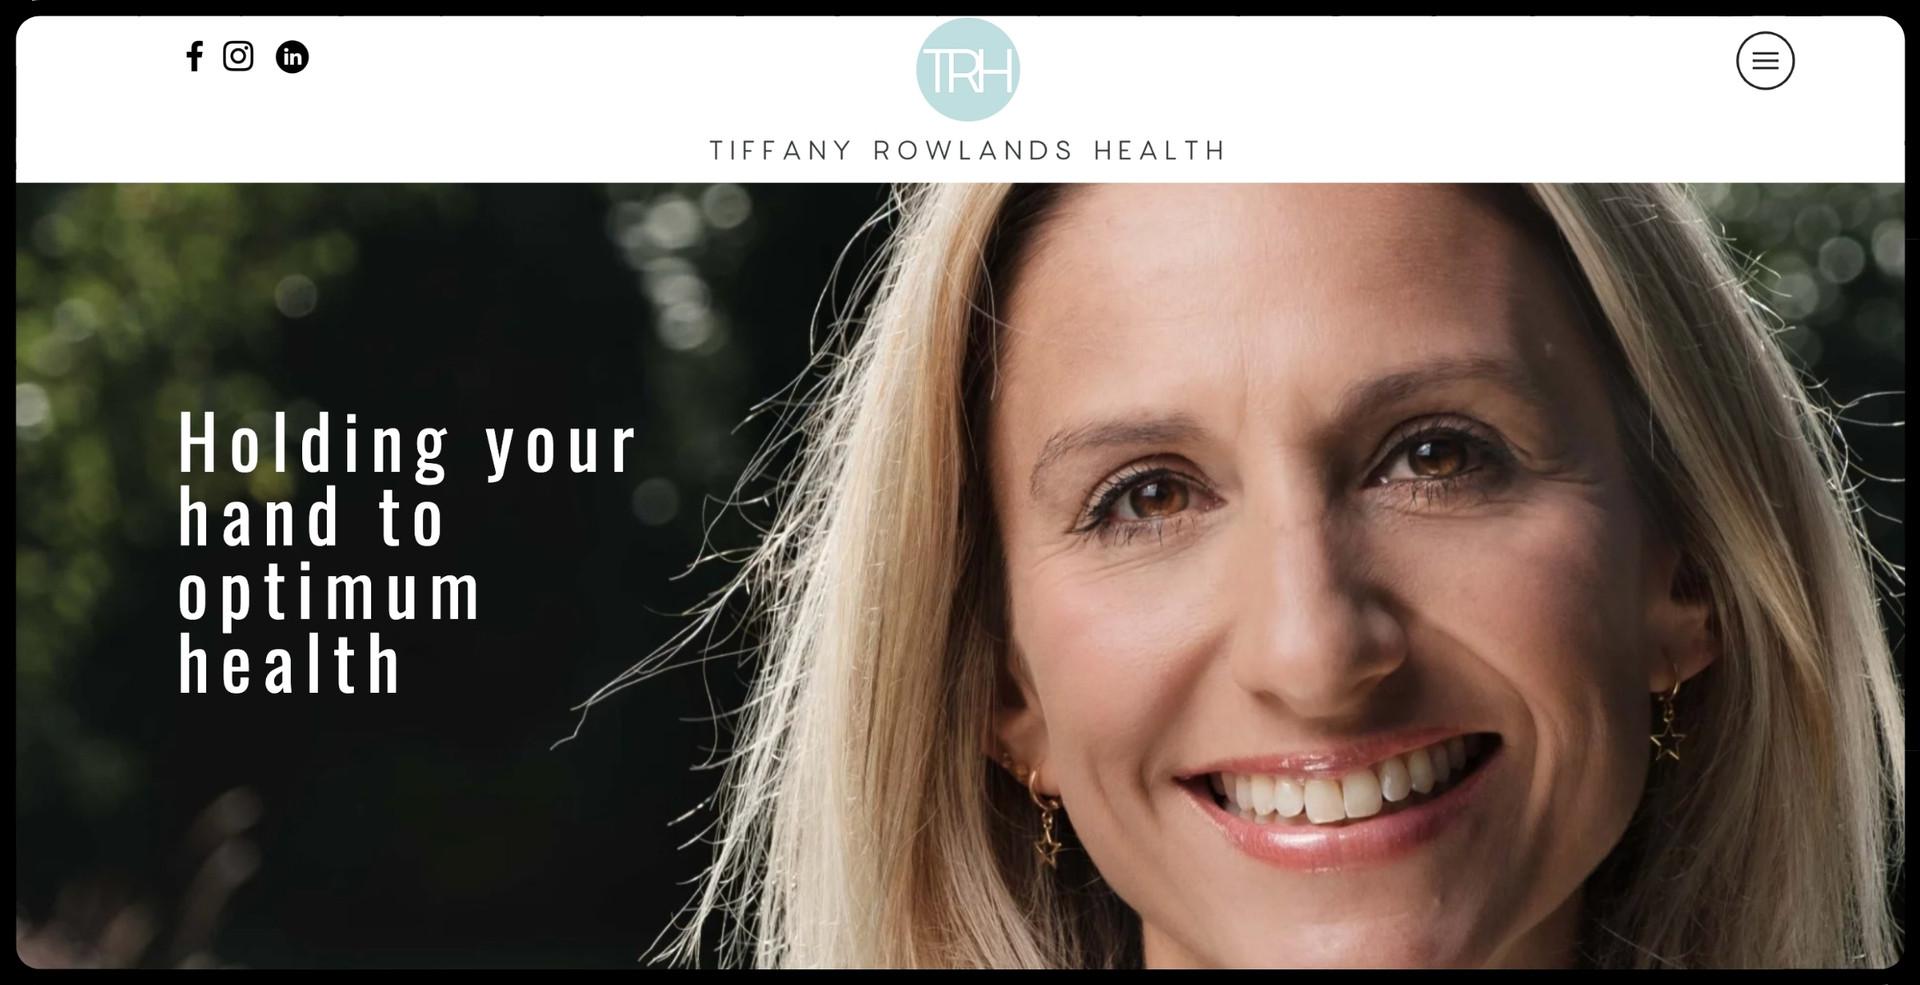 Tiffany Rowlands Health Home Page.jpg